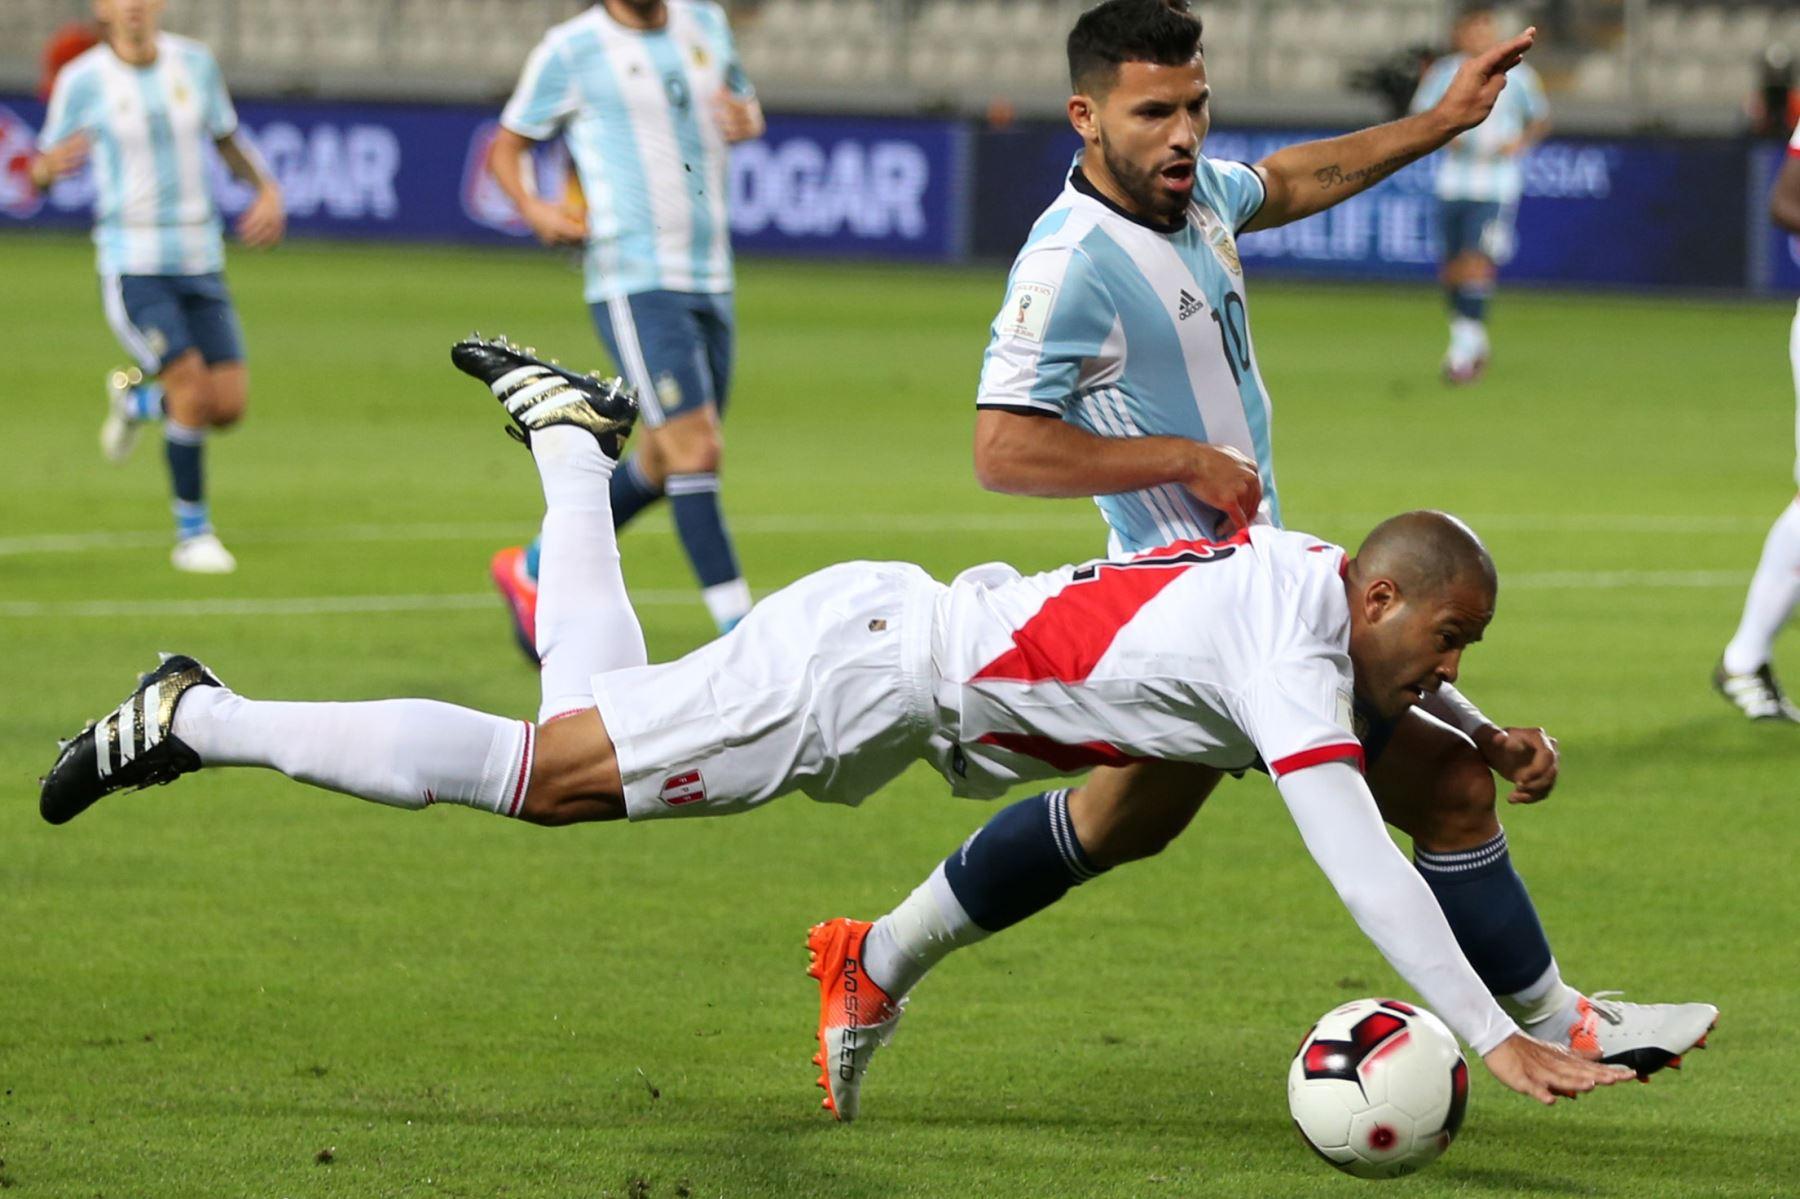 Alberto Rodríguez se volvió a lesionar — Selección Peruana